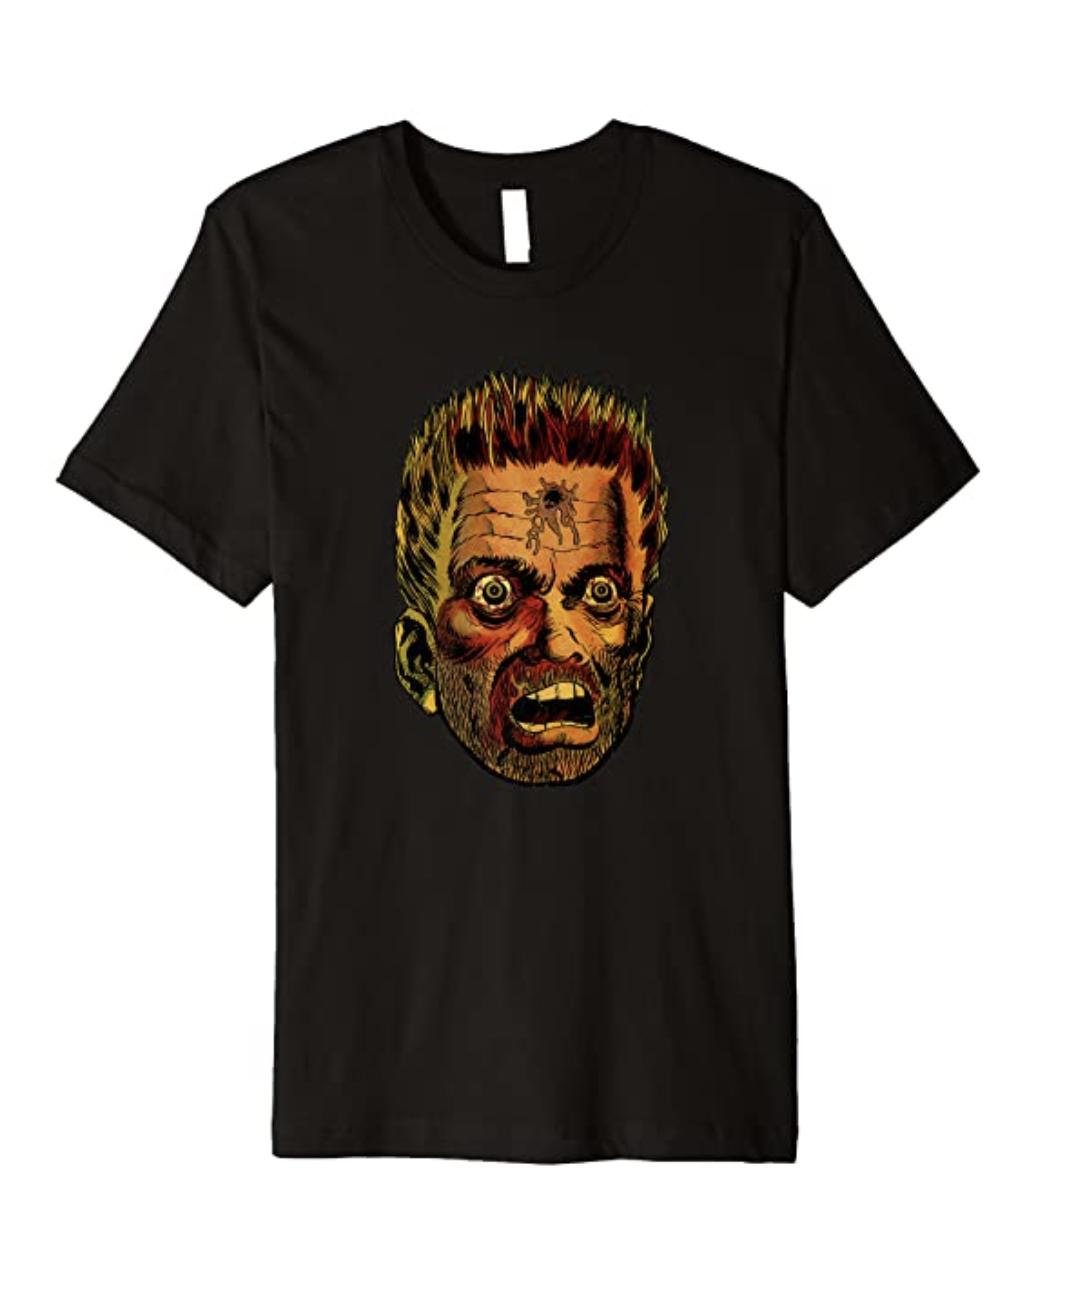 HEAD SHOT HORROR Vintage Zombies Undead Illustrated Premium T-Shirt